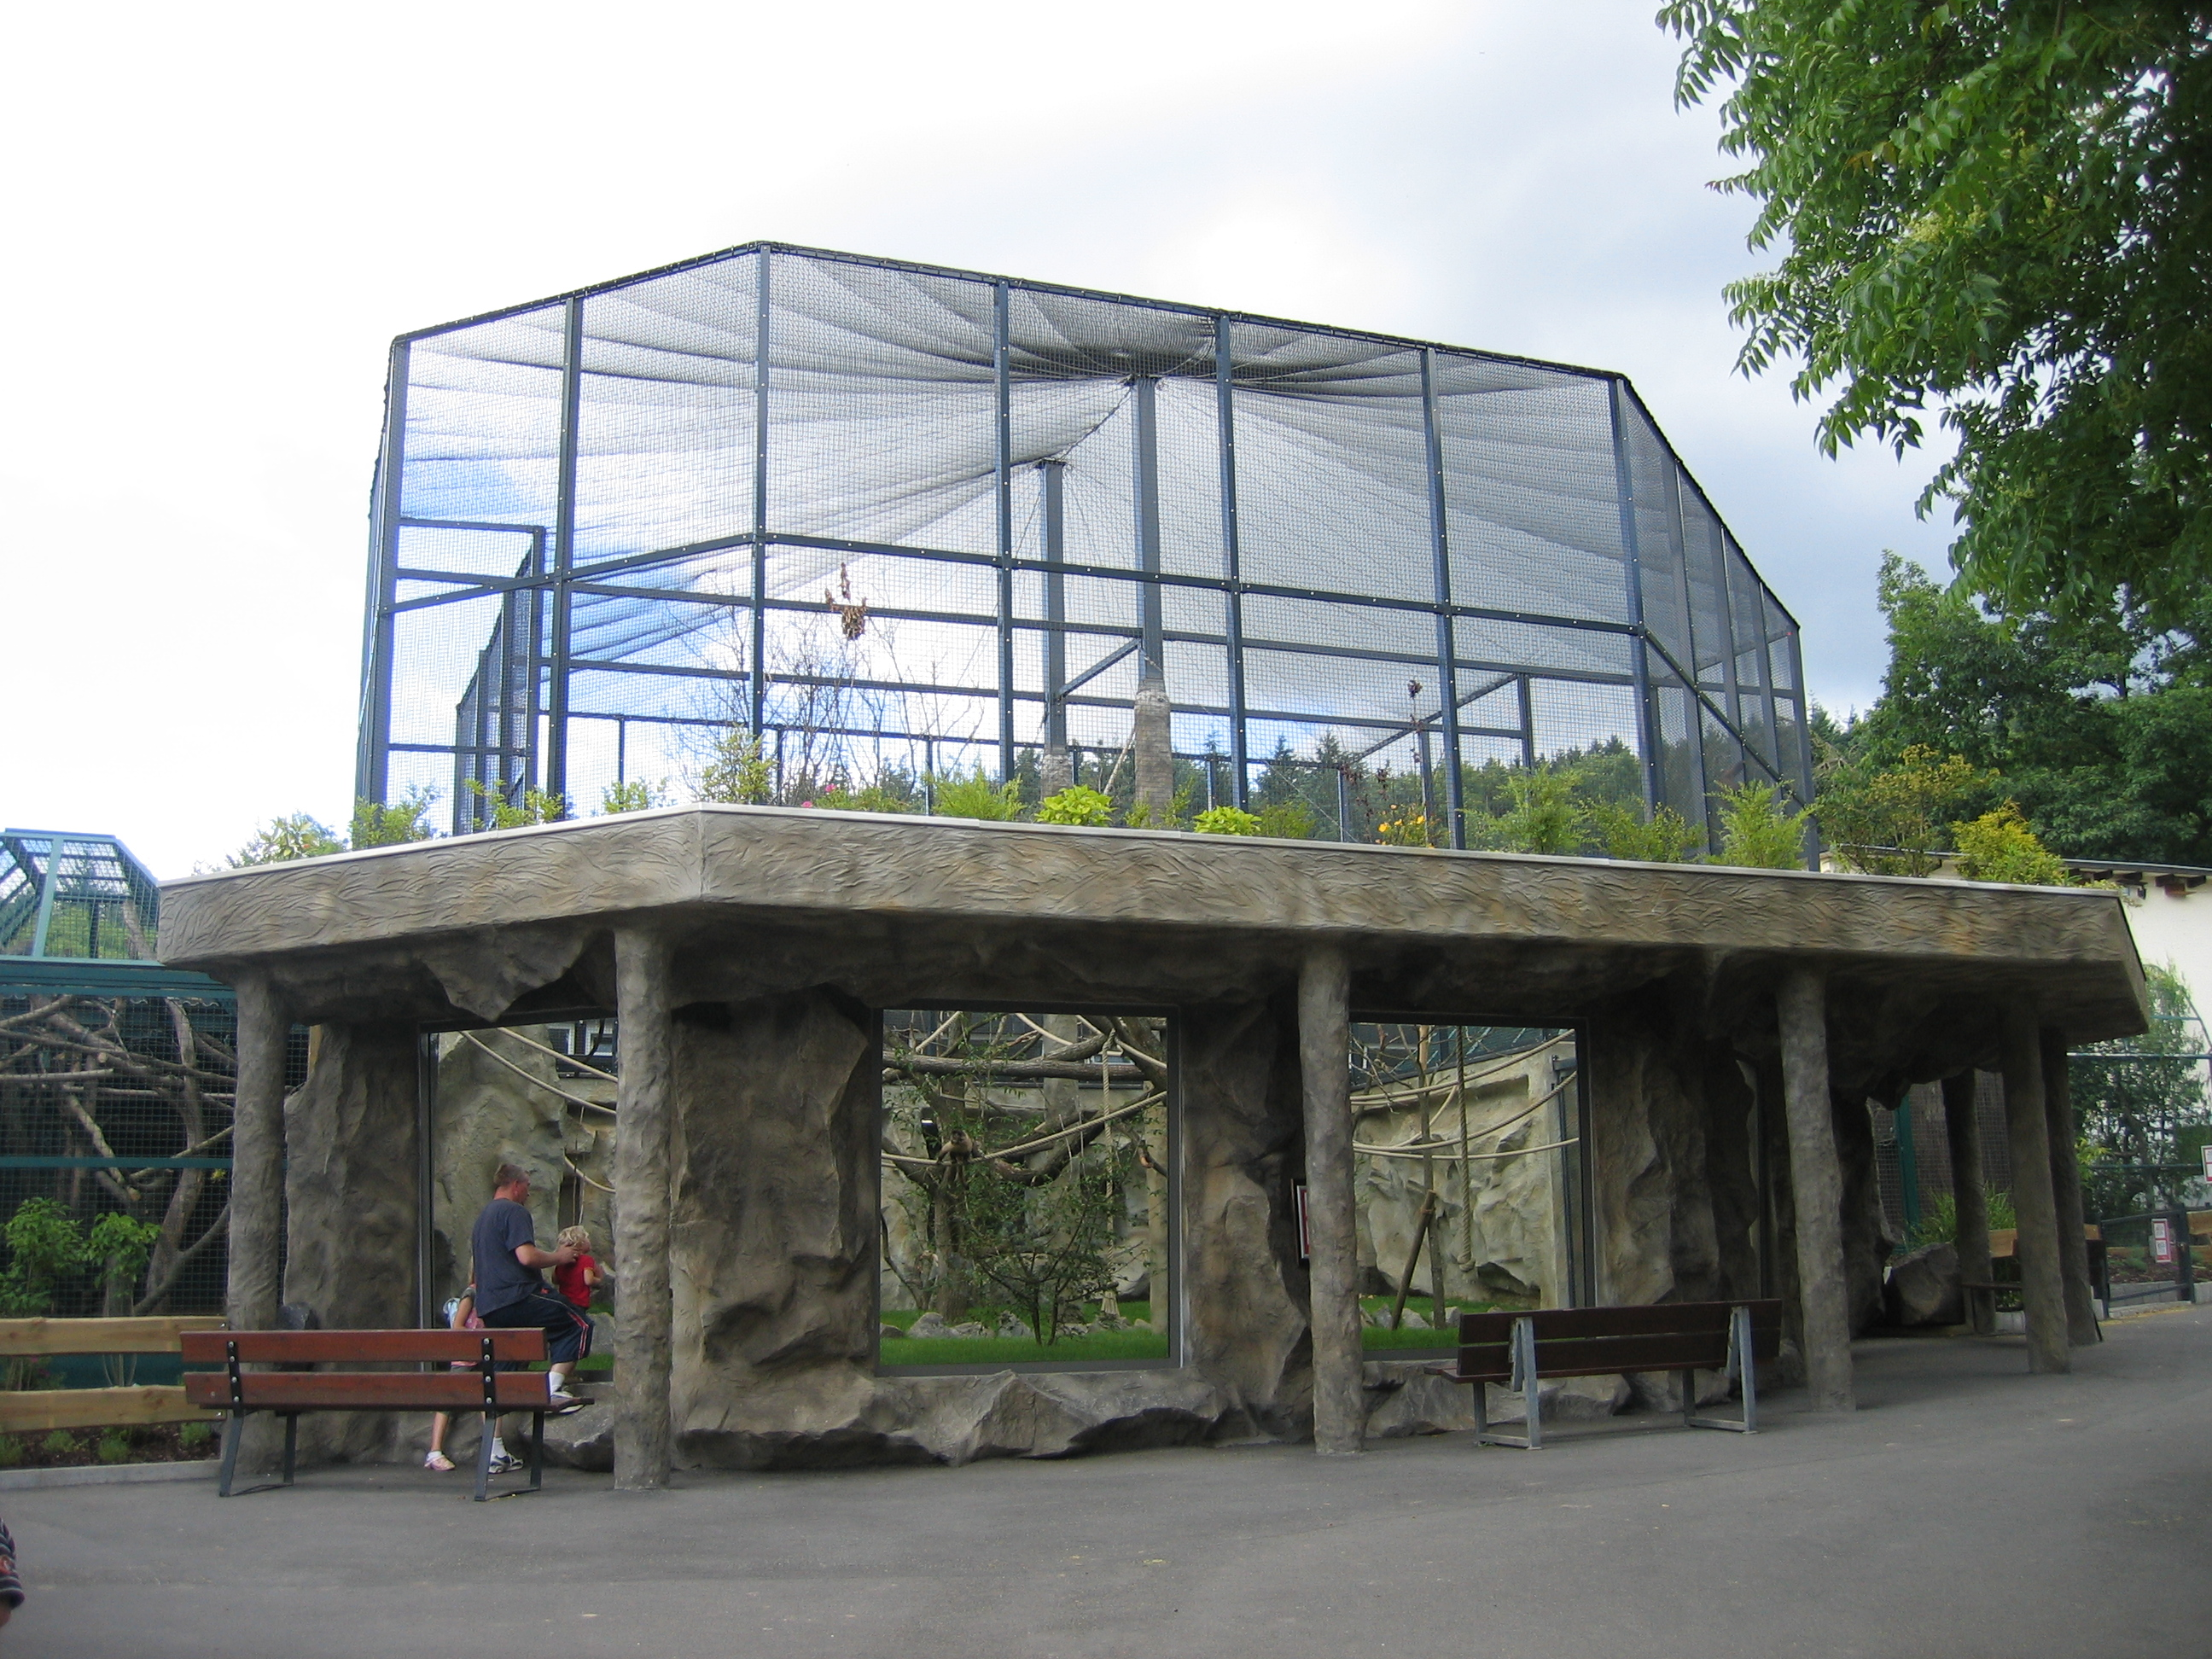 Zoo-neuwied-affenhaus.jpg